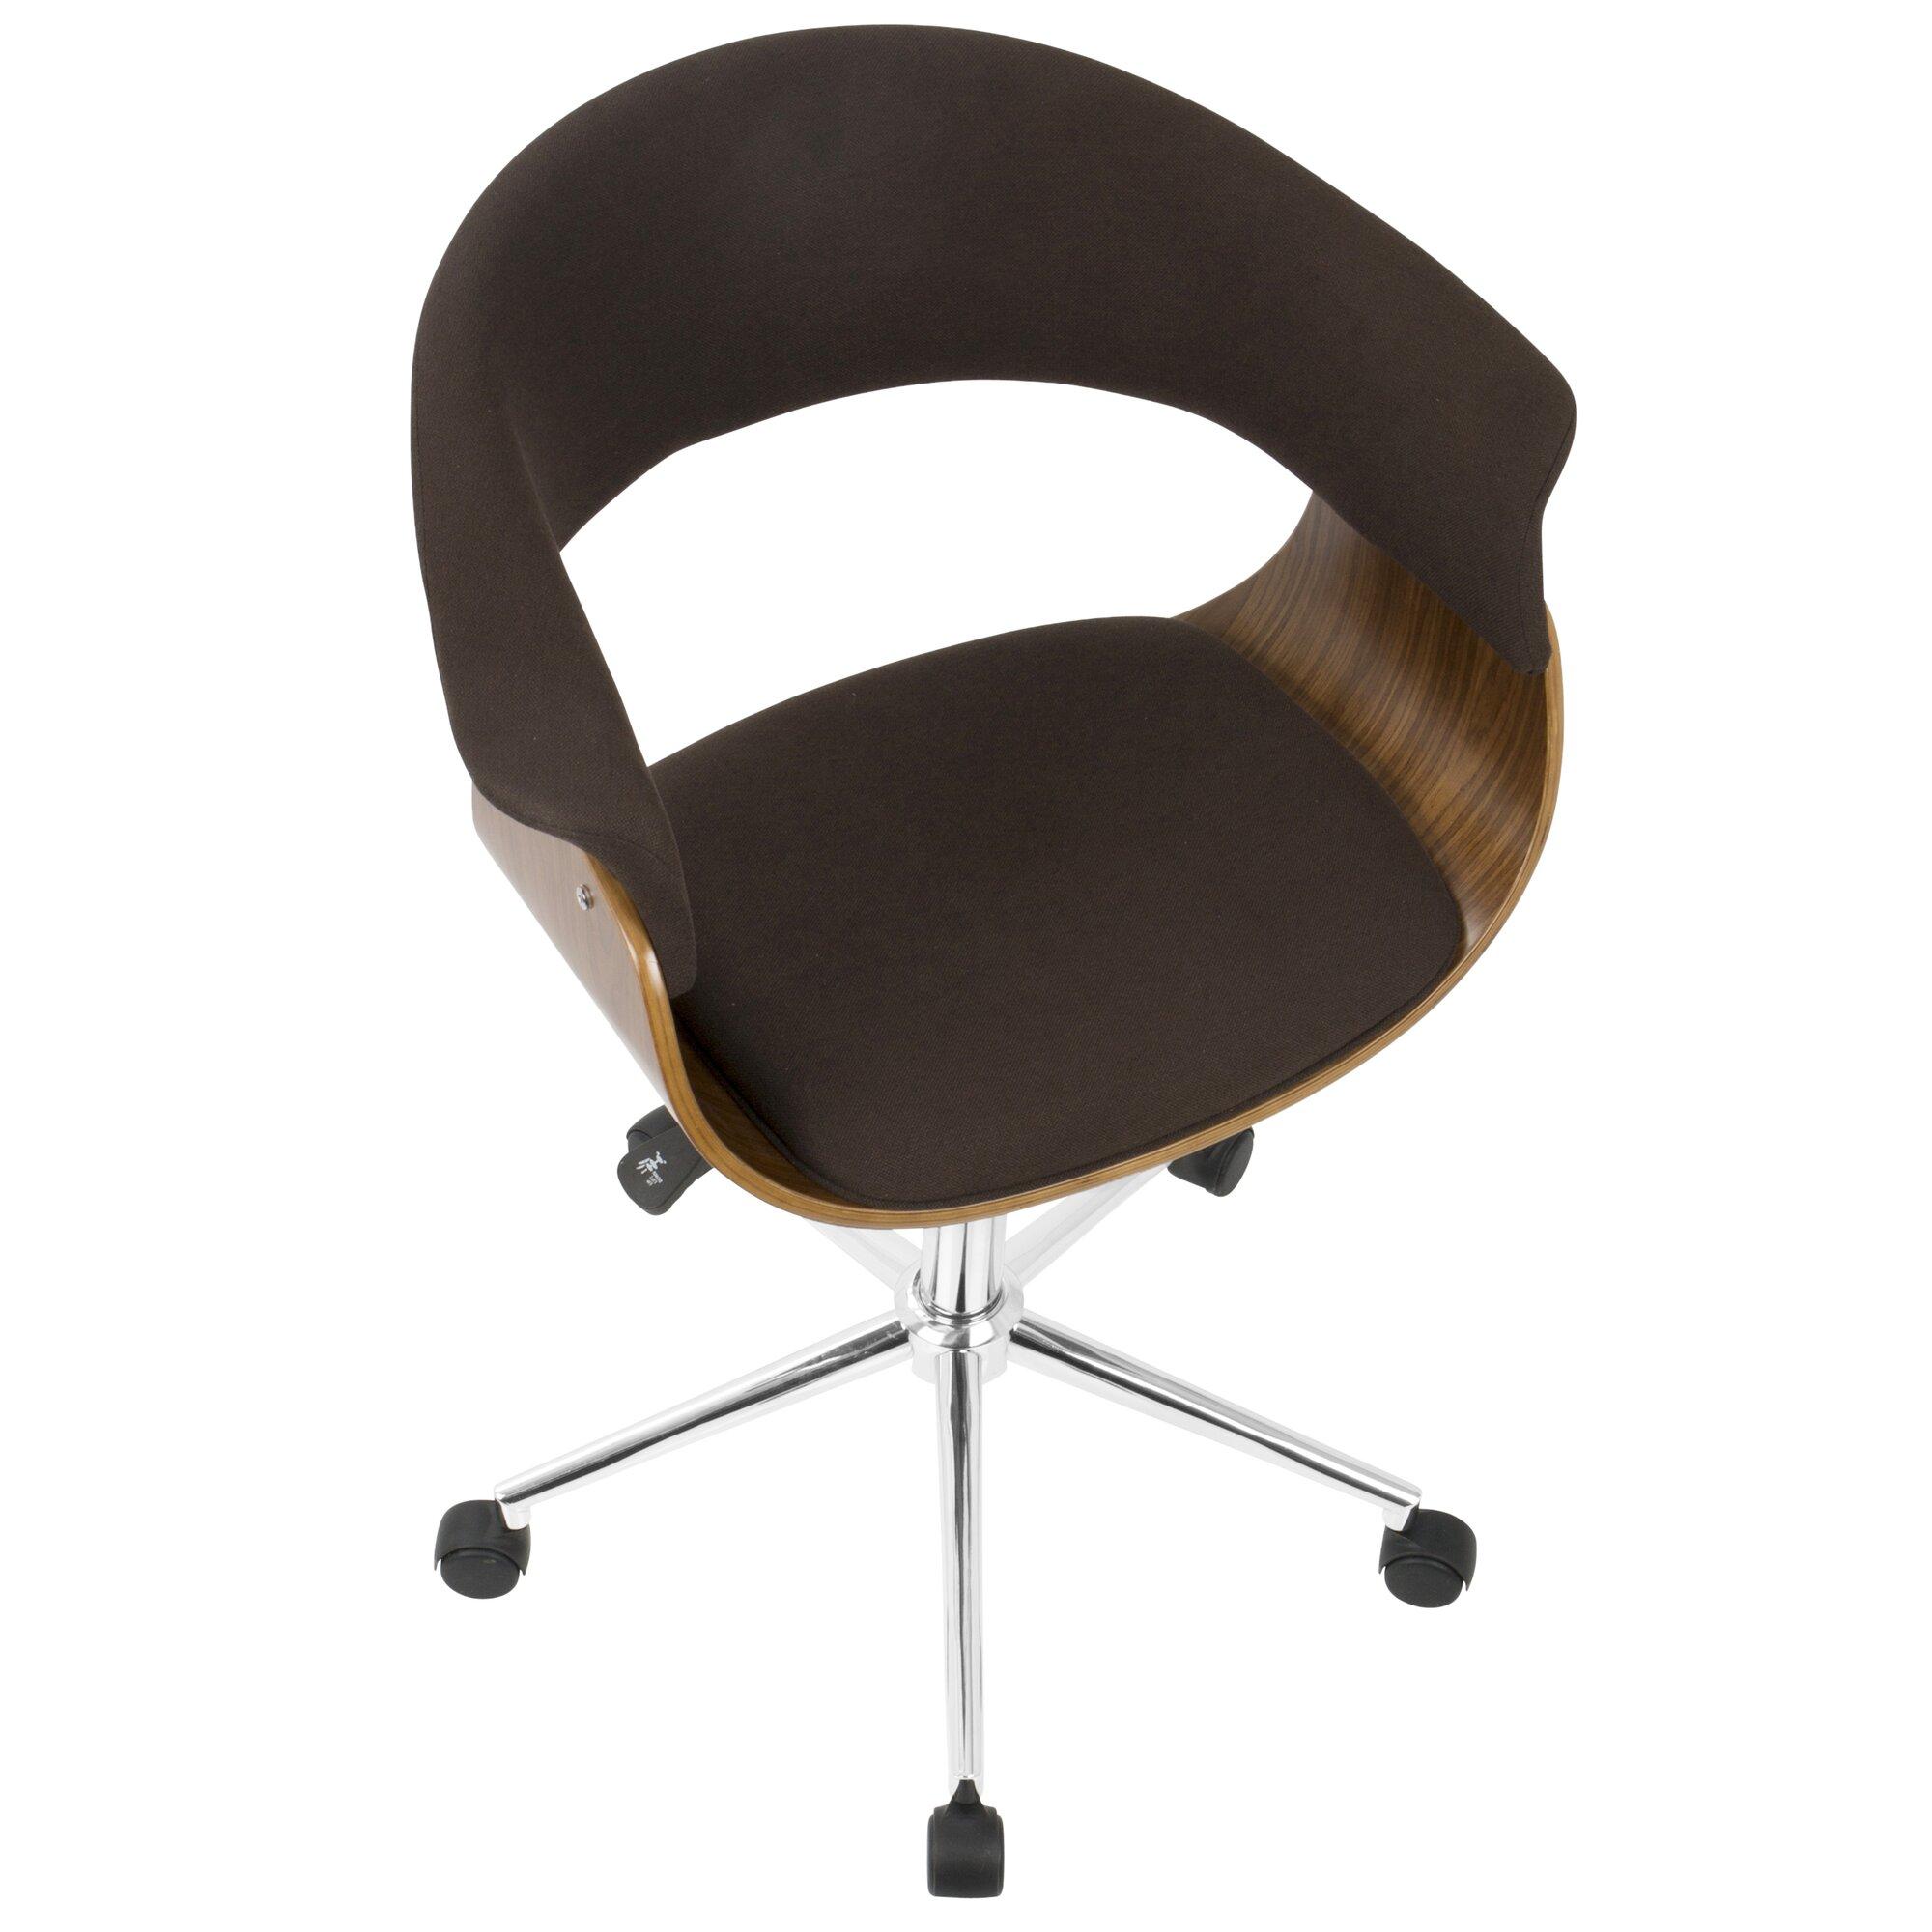 Mid Century Modern Desk Chair - Mid century modern office chair